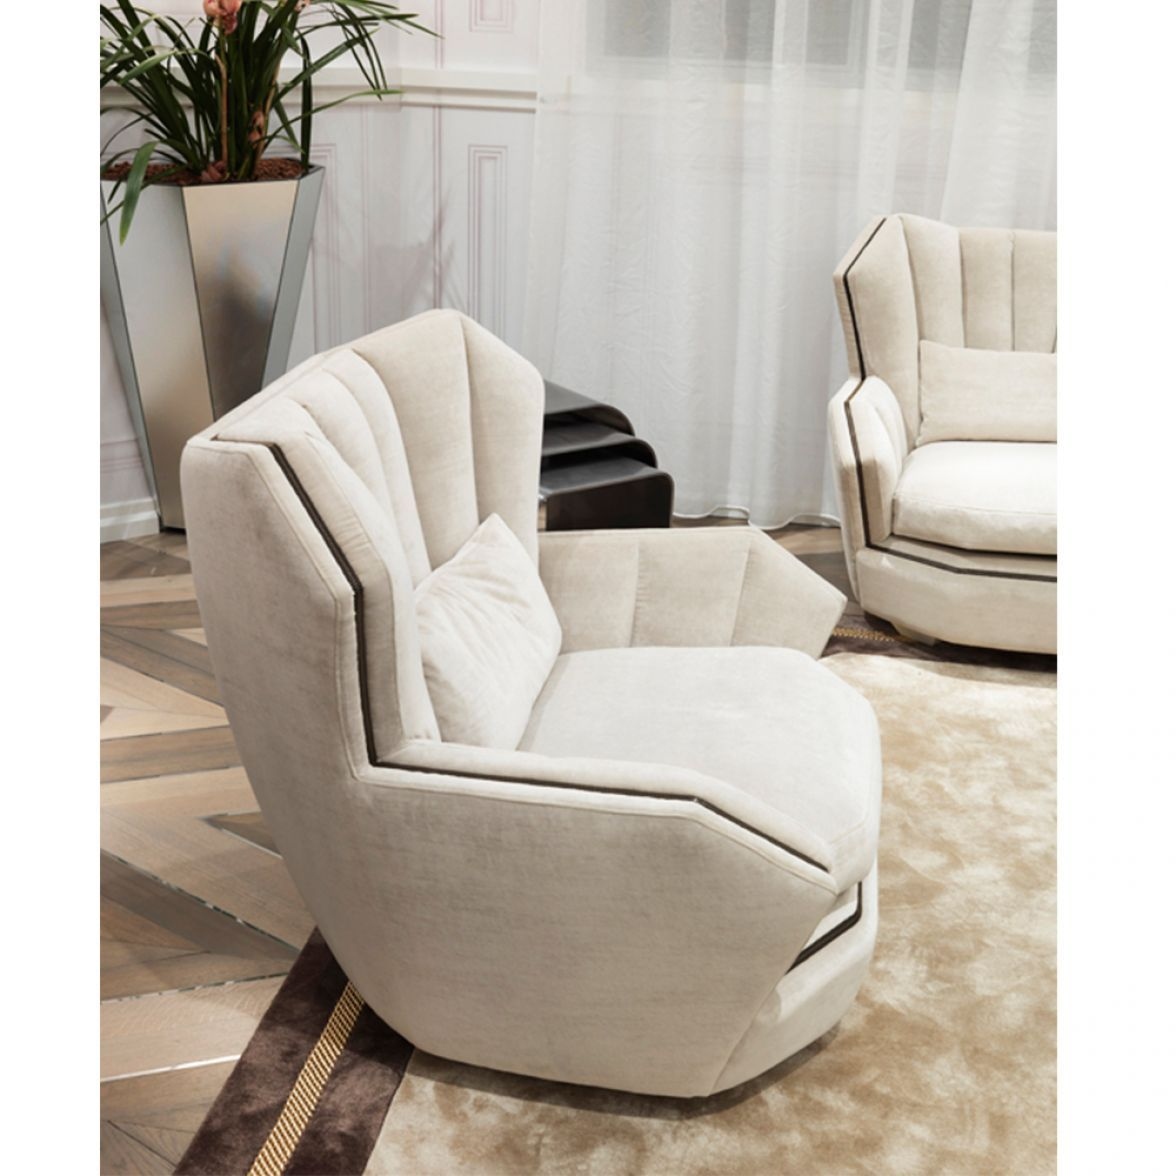 Hemingway armchair фото цена